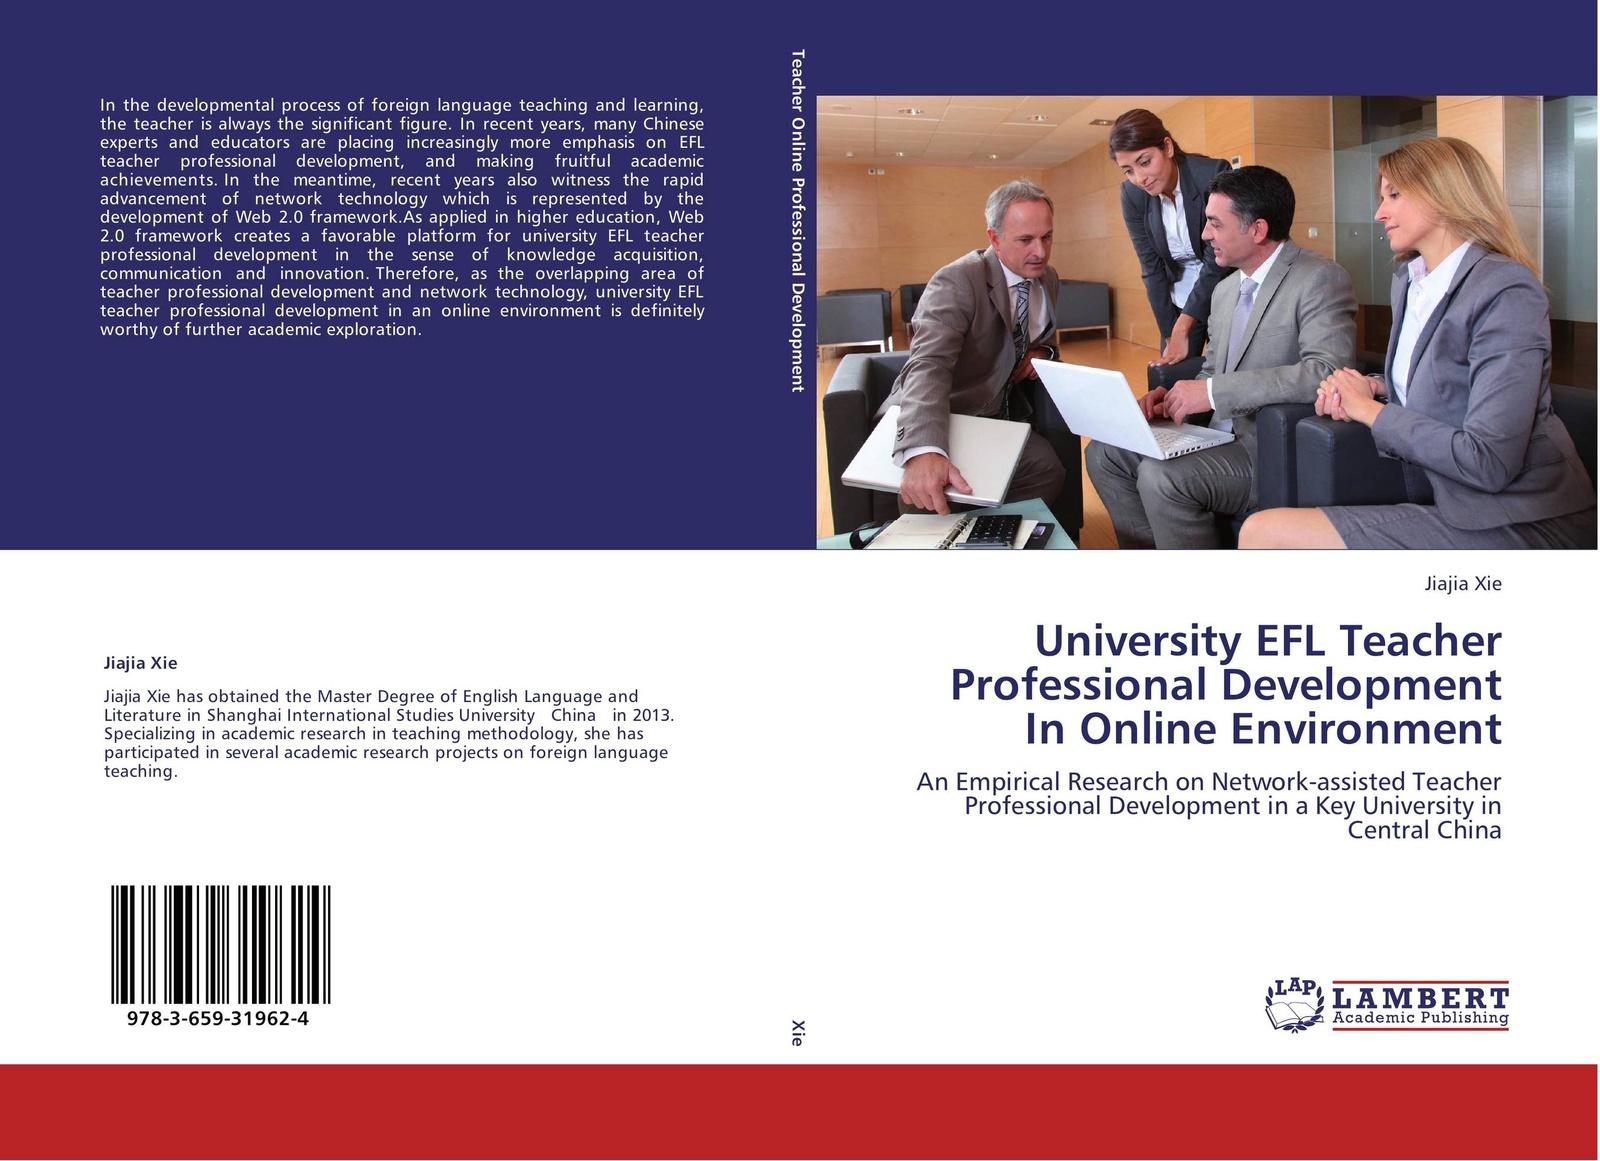 Jiajia Xie University EFL Teacher Professional Development In Online Environment re imagining teacher professional learning for social change